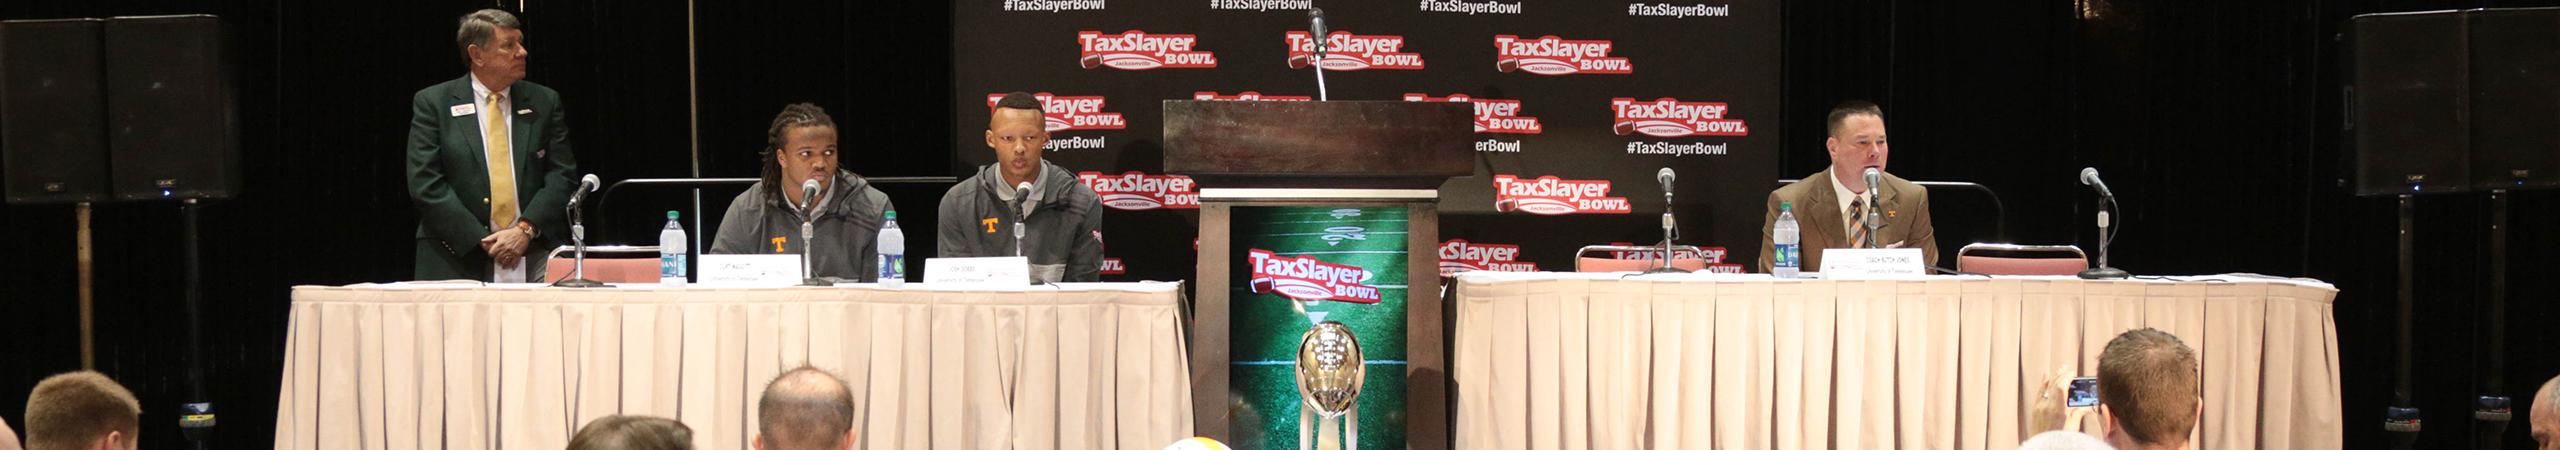 TaxSlayer Bowl Press Conference